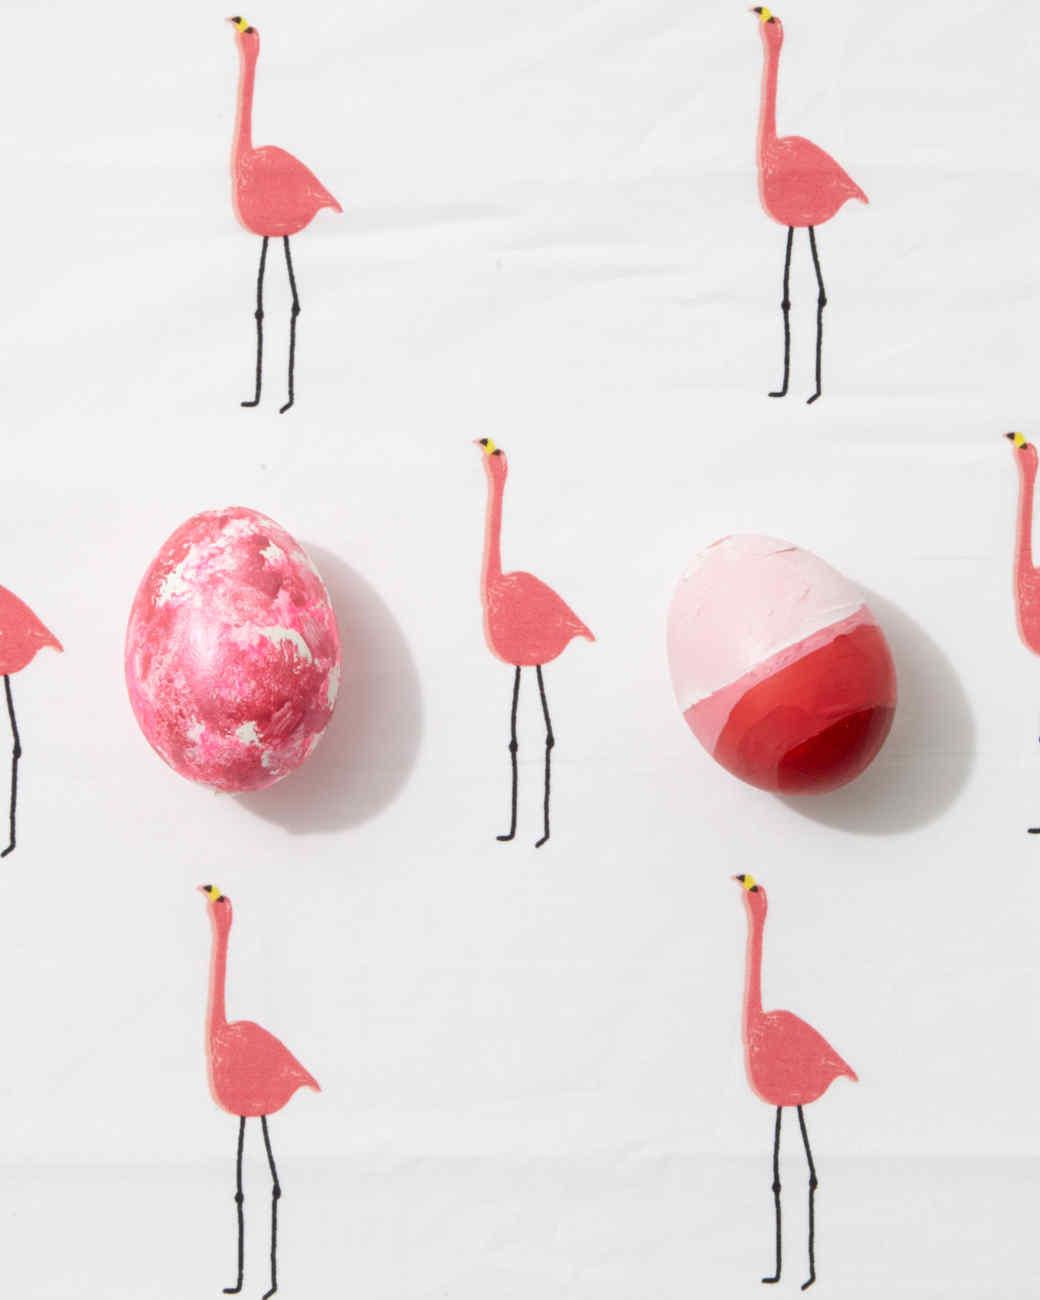 flamingo-0010.jpg